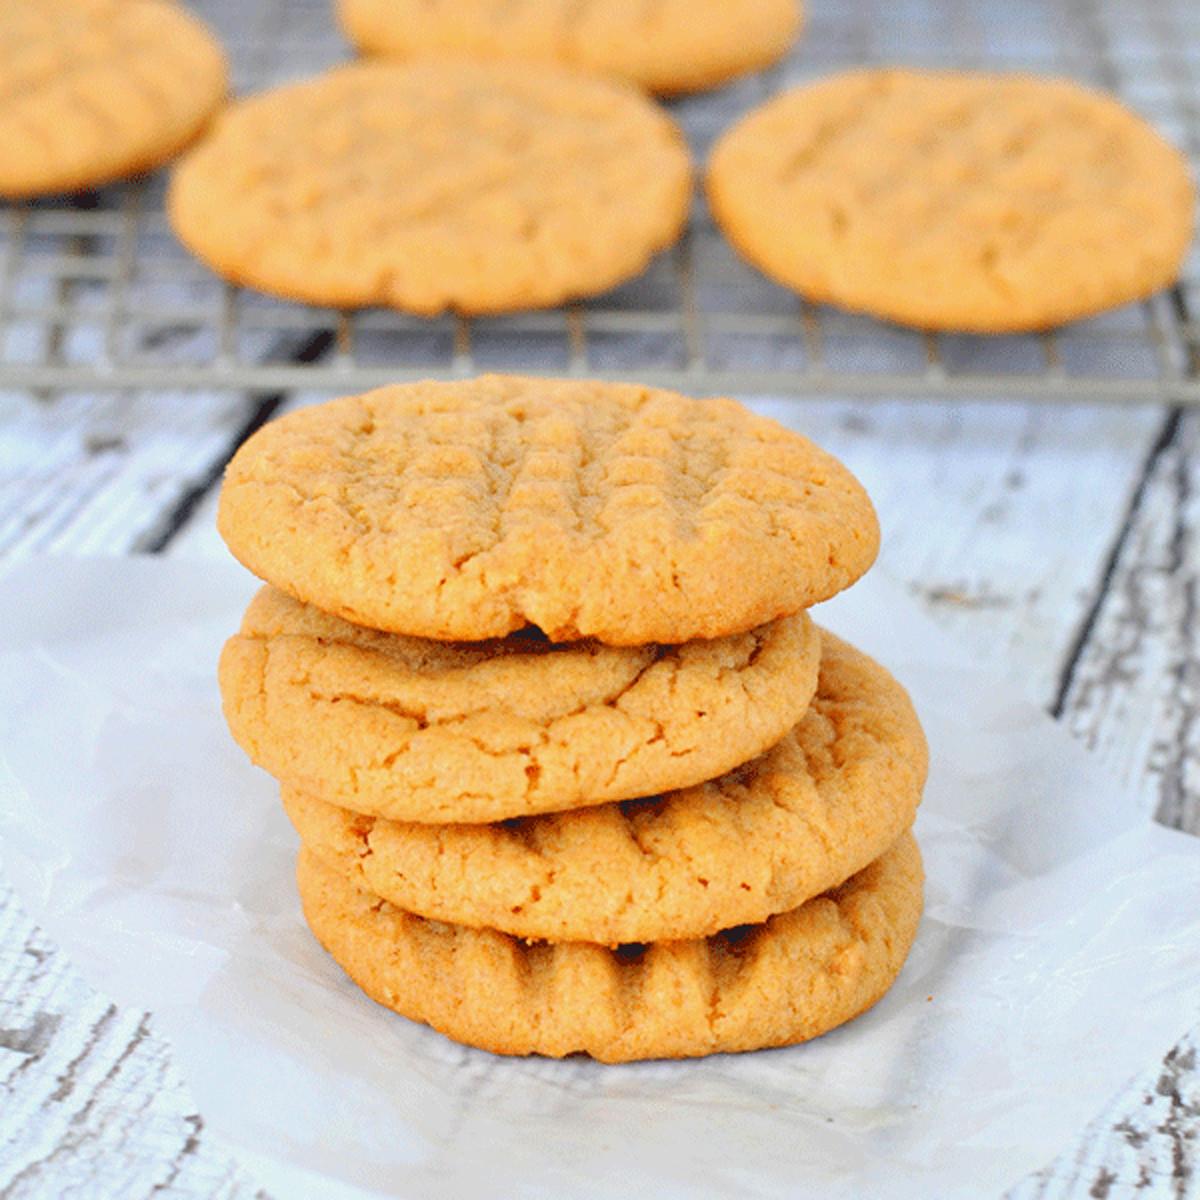 Sugar Free Peanut Butter Cookies  Sugar Free Peanut Butter Cookies